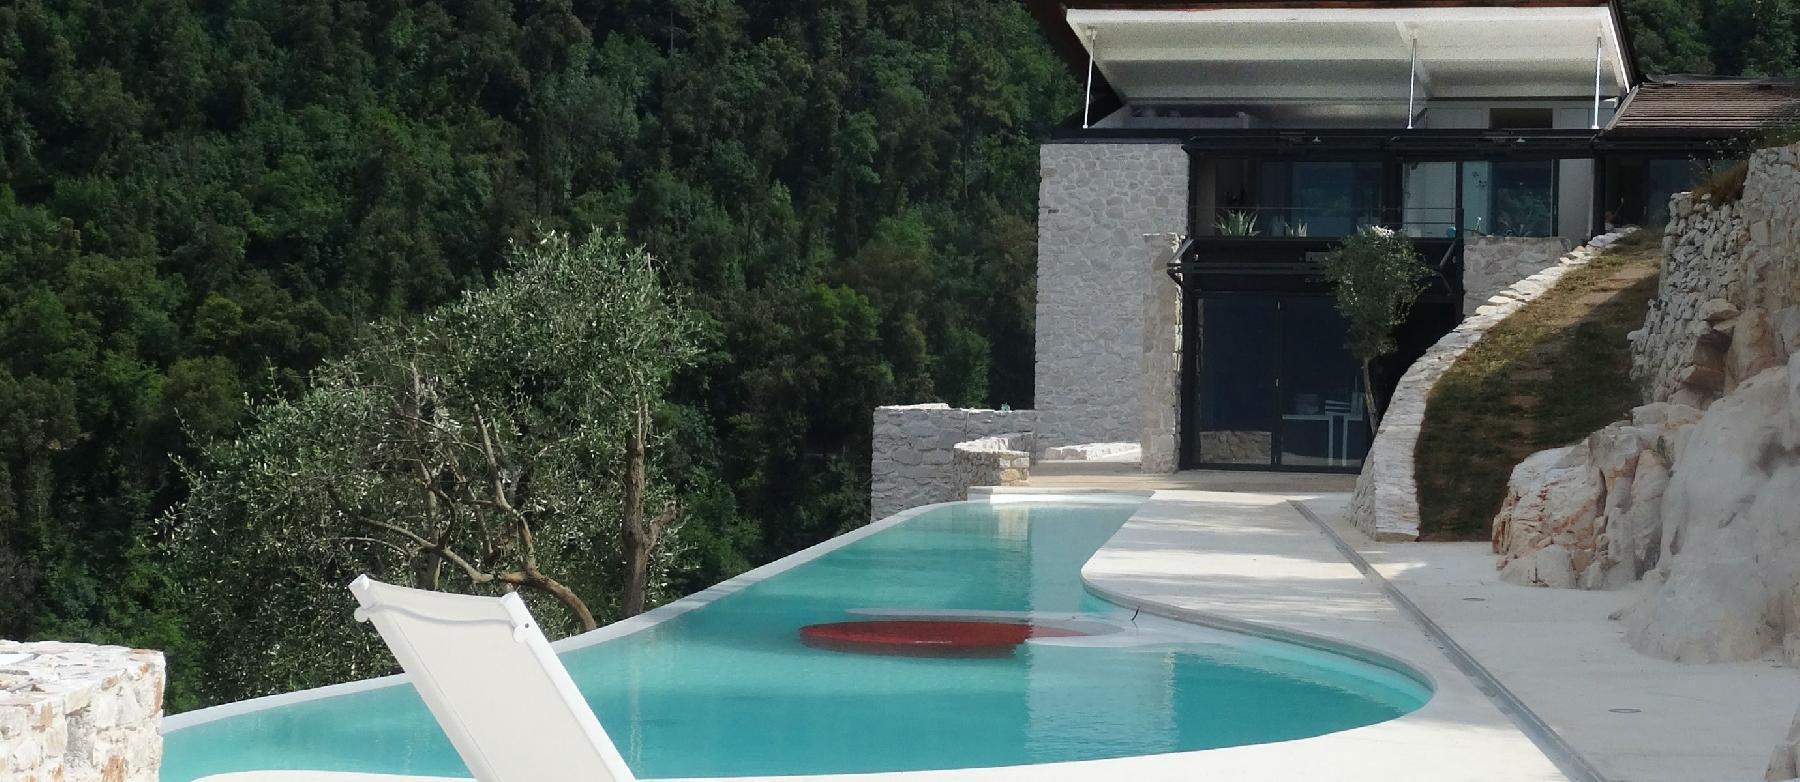 amazing Tuscany - Butterfly House Villa luxury apartment